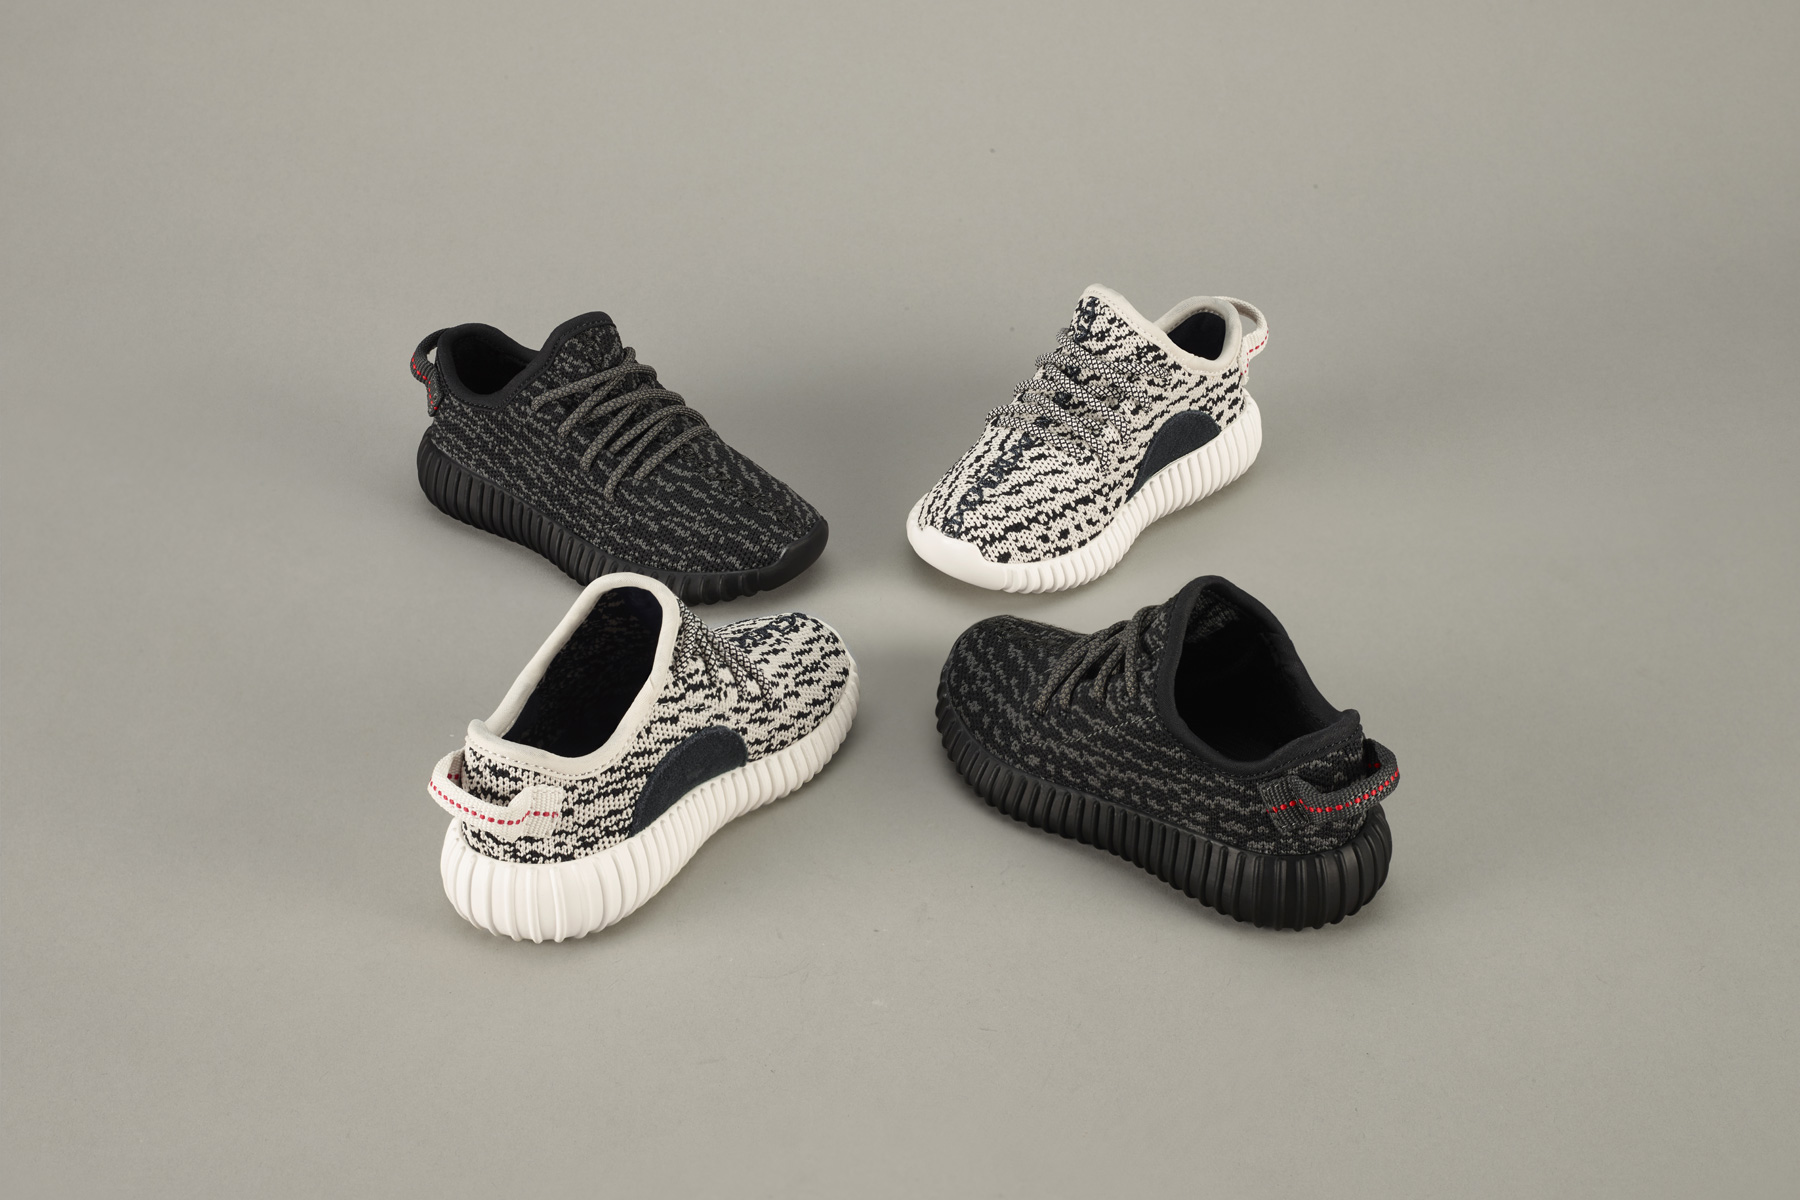 adidas yeezy 750 price philippines adidas superstar kids navy